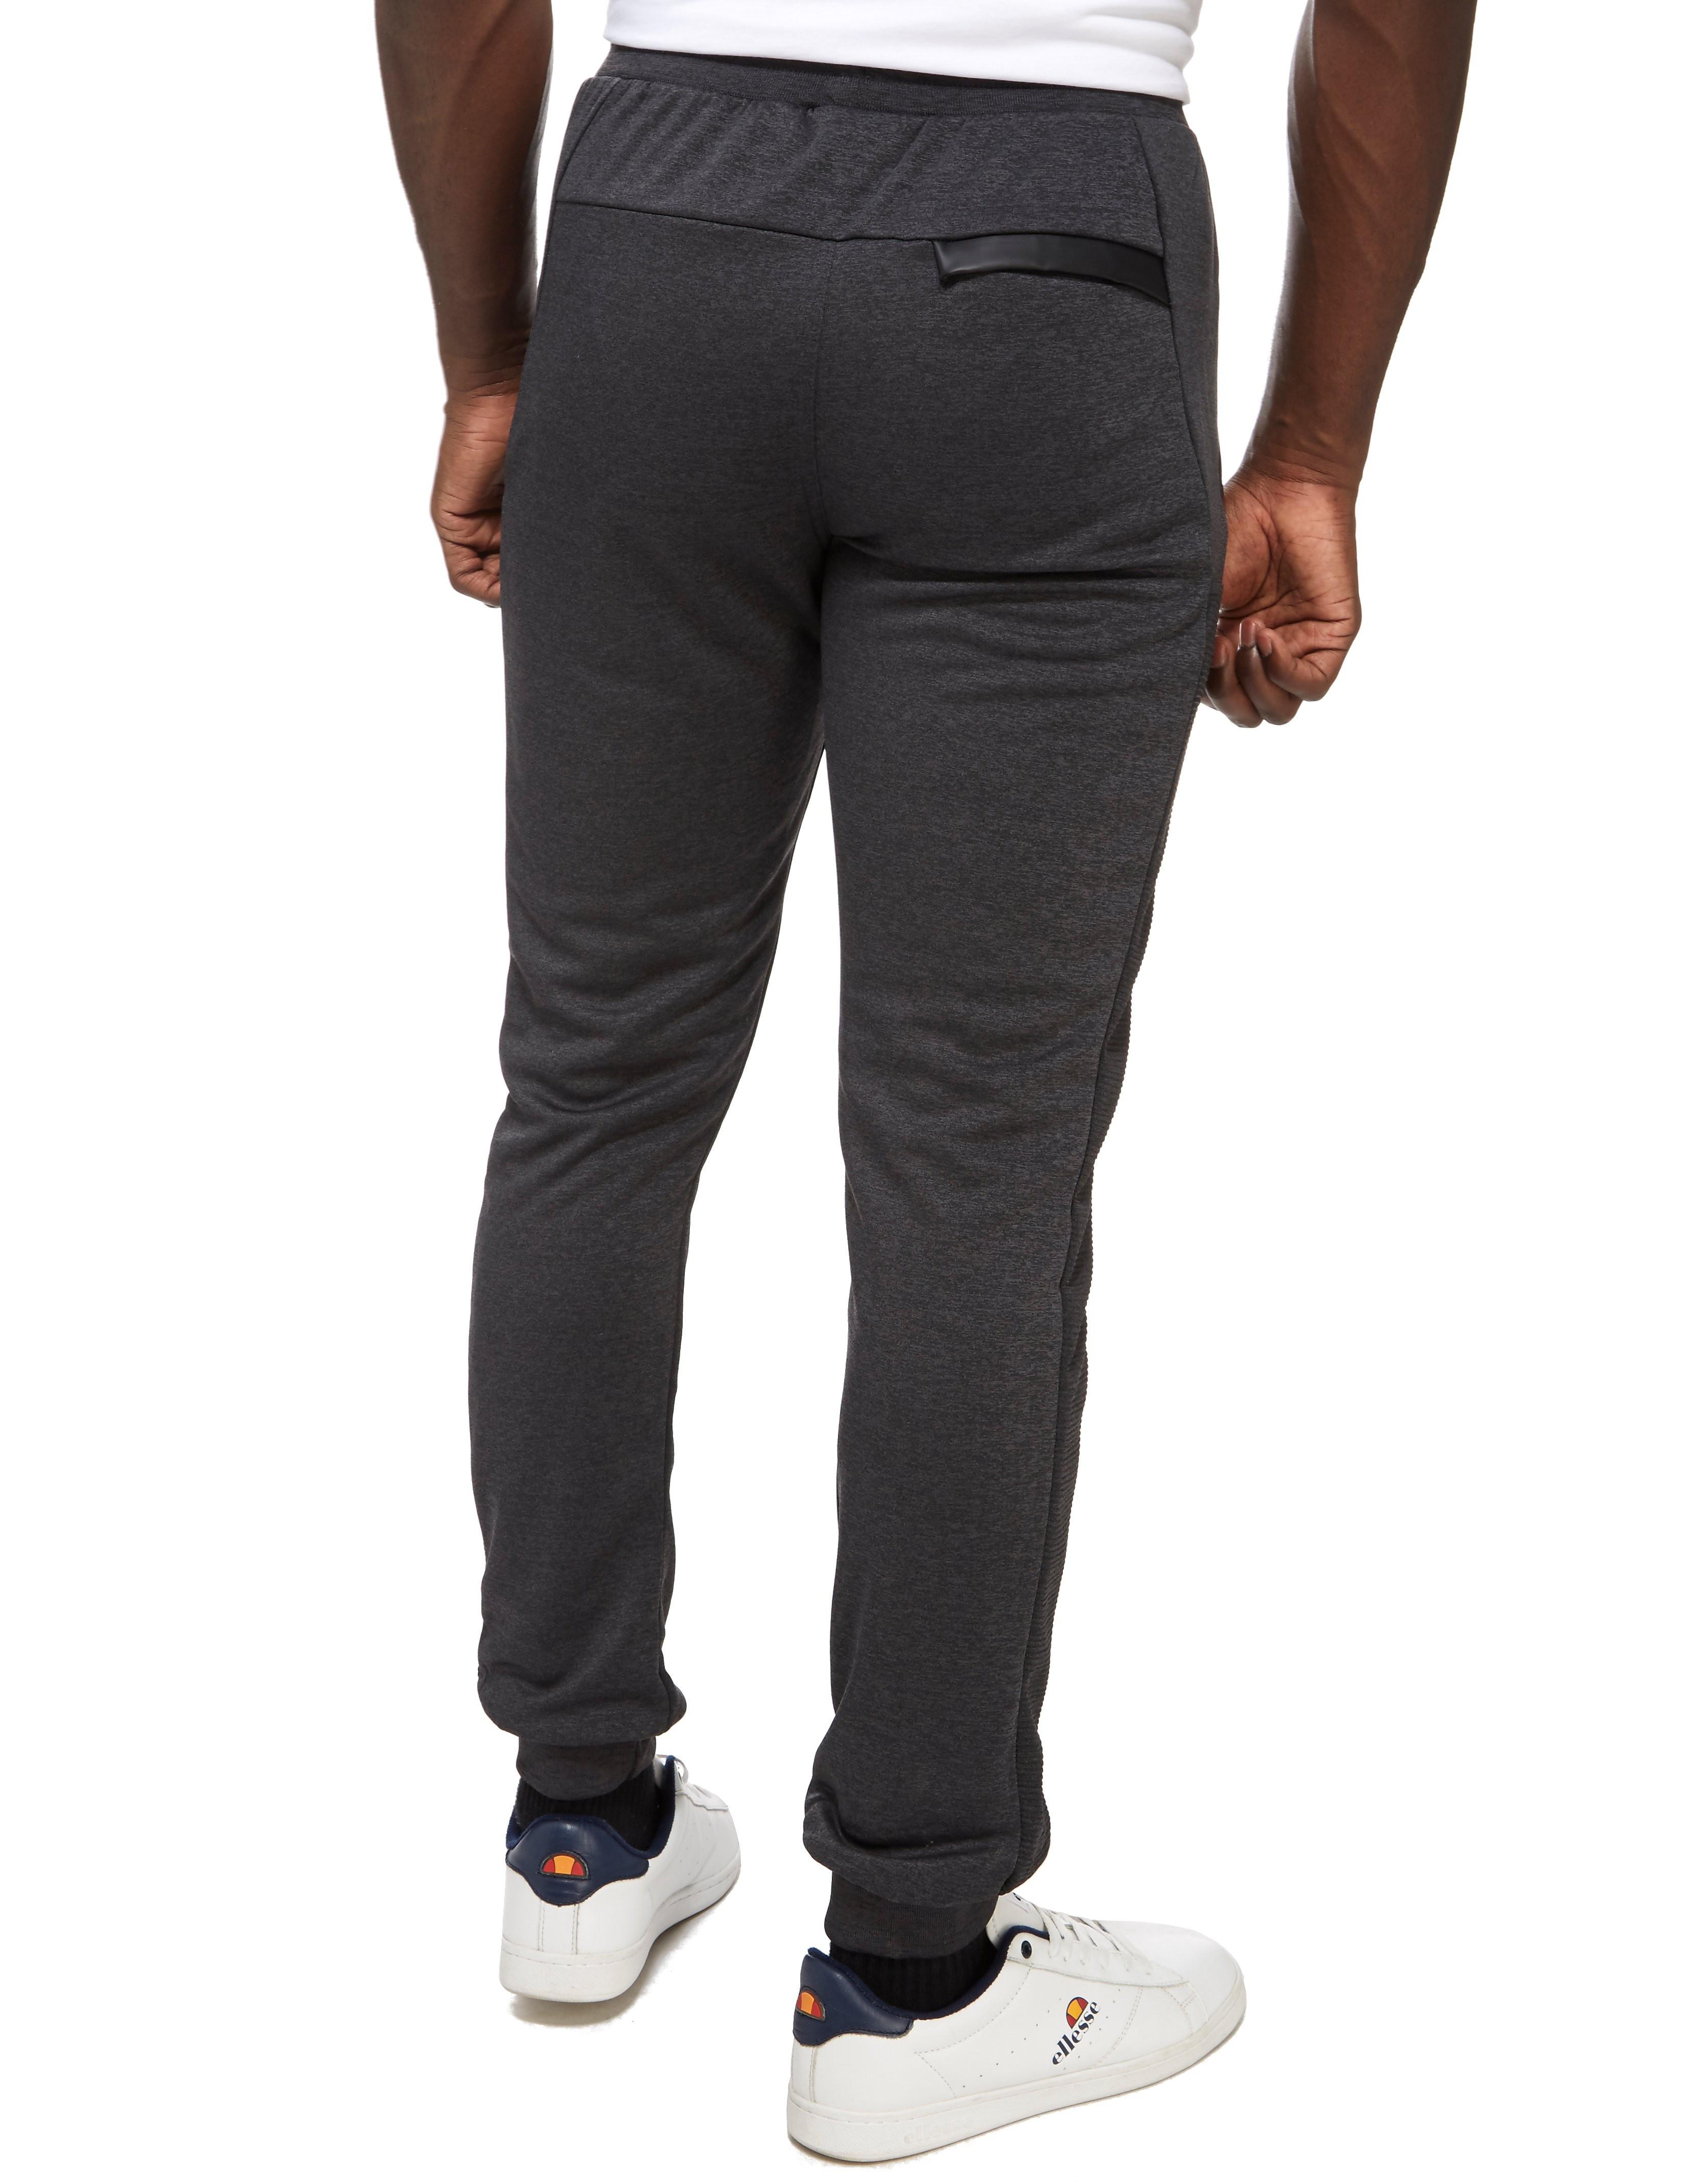 Ellesse Pantalon de survêtement Oloporta Rib Homme